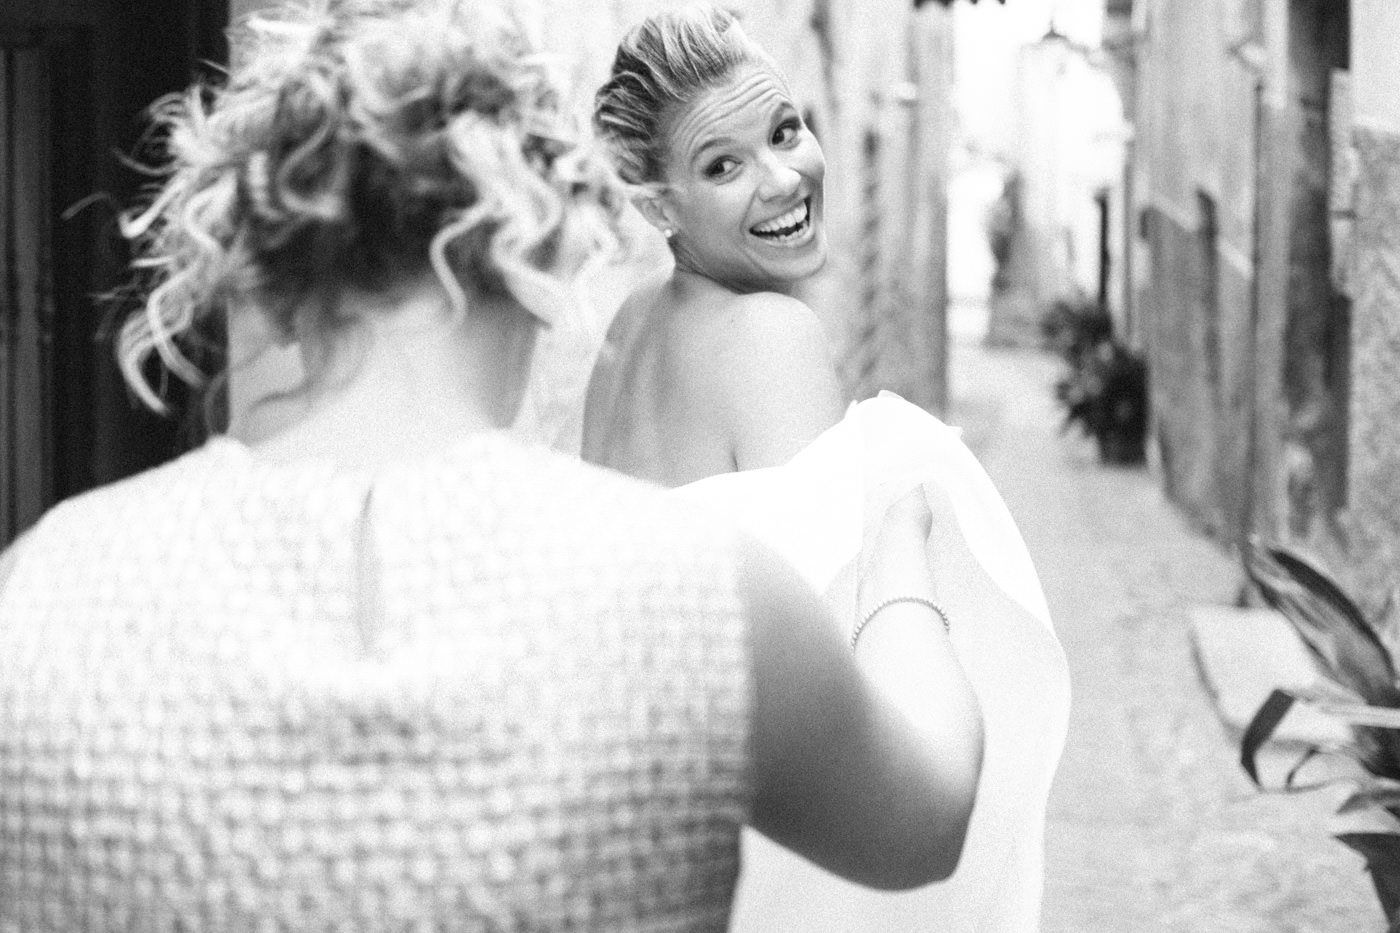 matrimoni_all_italiana_fotografo_matrimonio_cinque_terre-16.jpg